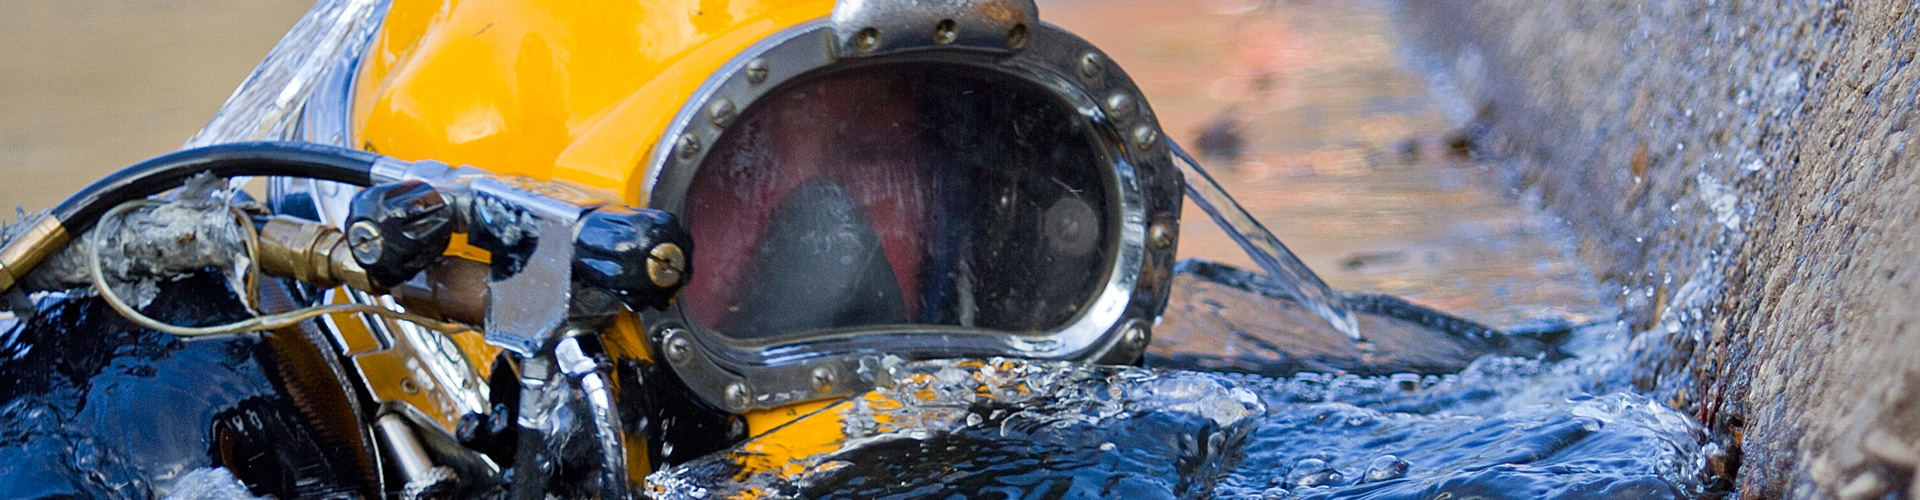 dive careers, commercial diving careers, underwater diving careers